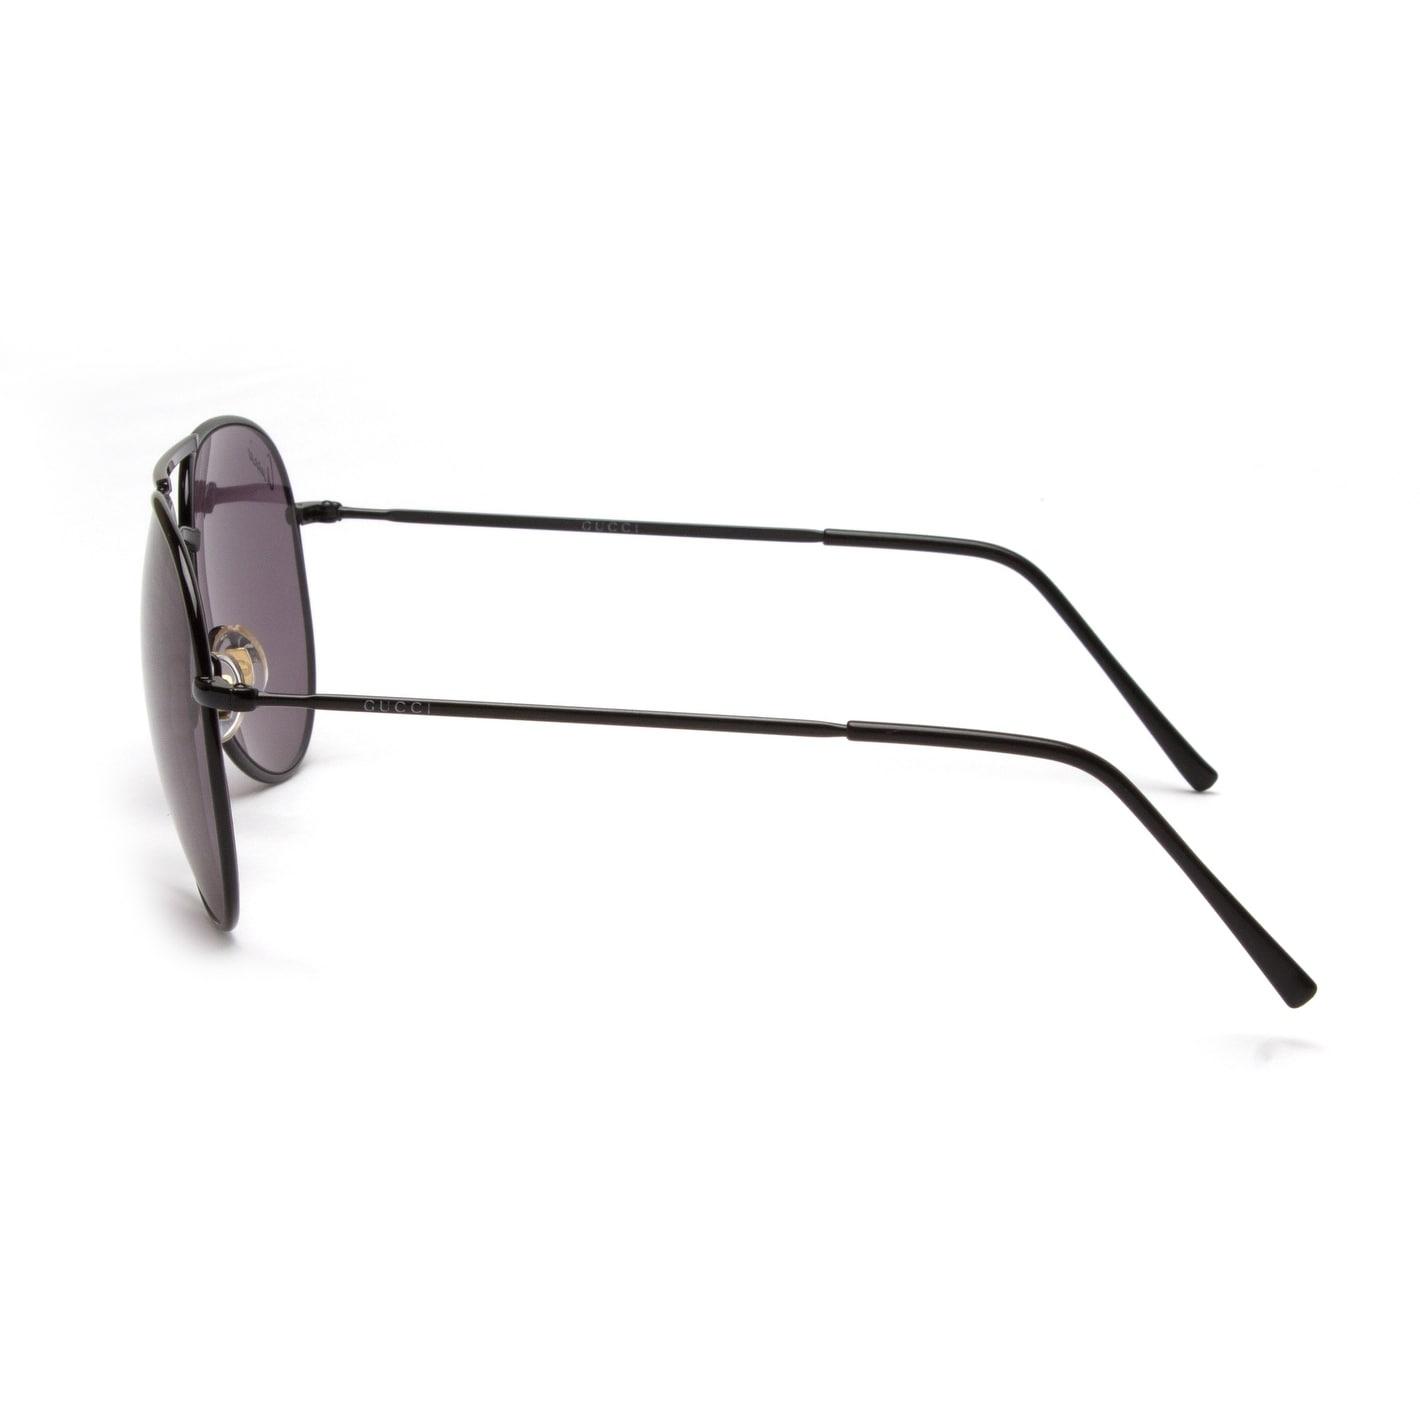 1c896de8a8a Shop Gucci Men s Women s Unisex Aviator Sunglasses 1287 S Black - Small -  Free Shipping Today - Overstock - 13473836